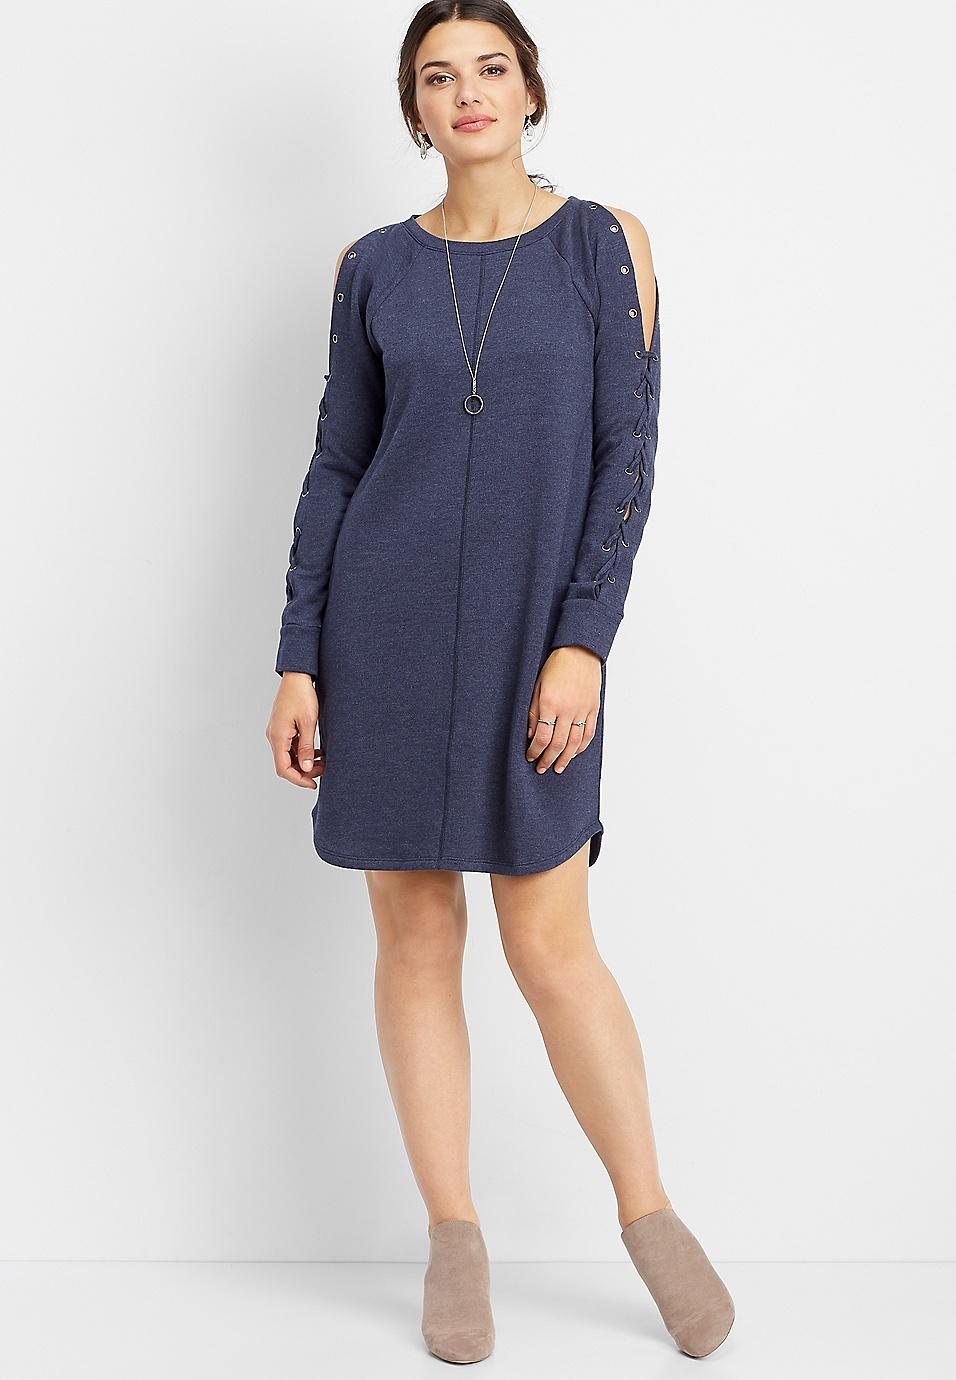 grommet lace up sleeve sweatshirt dress  97b7c3245